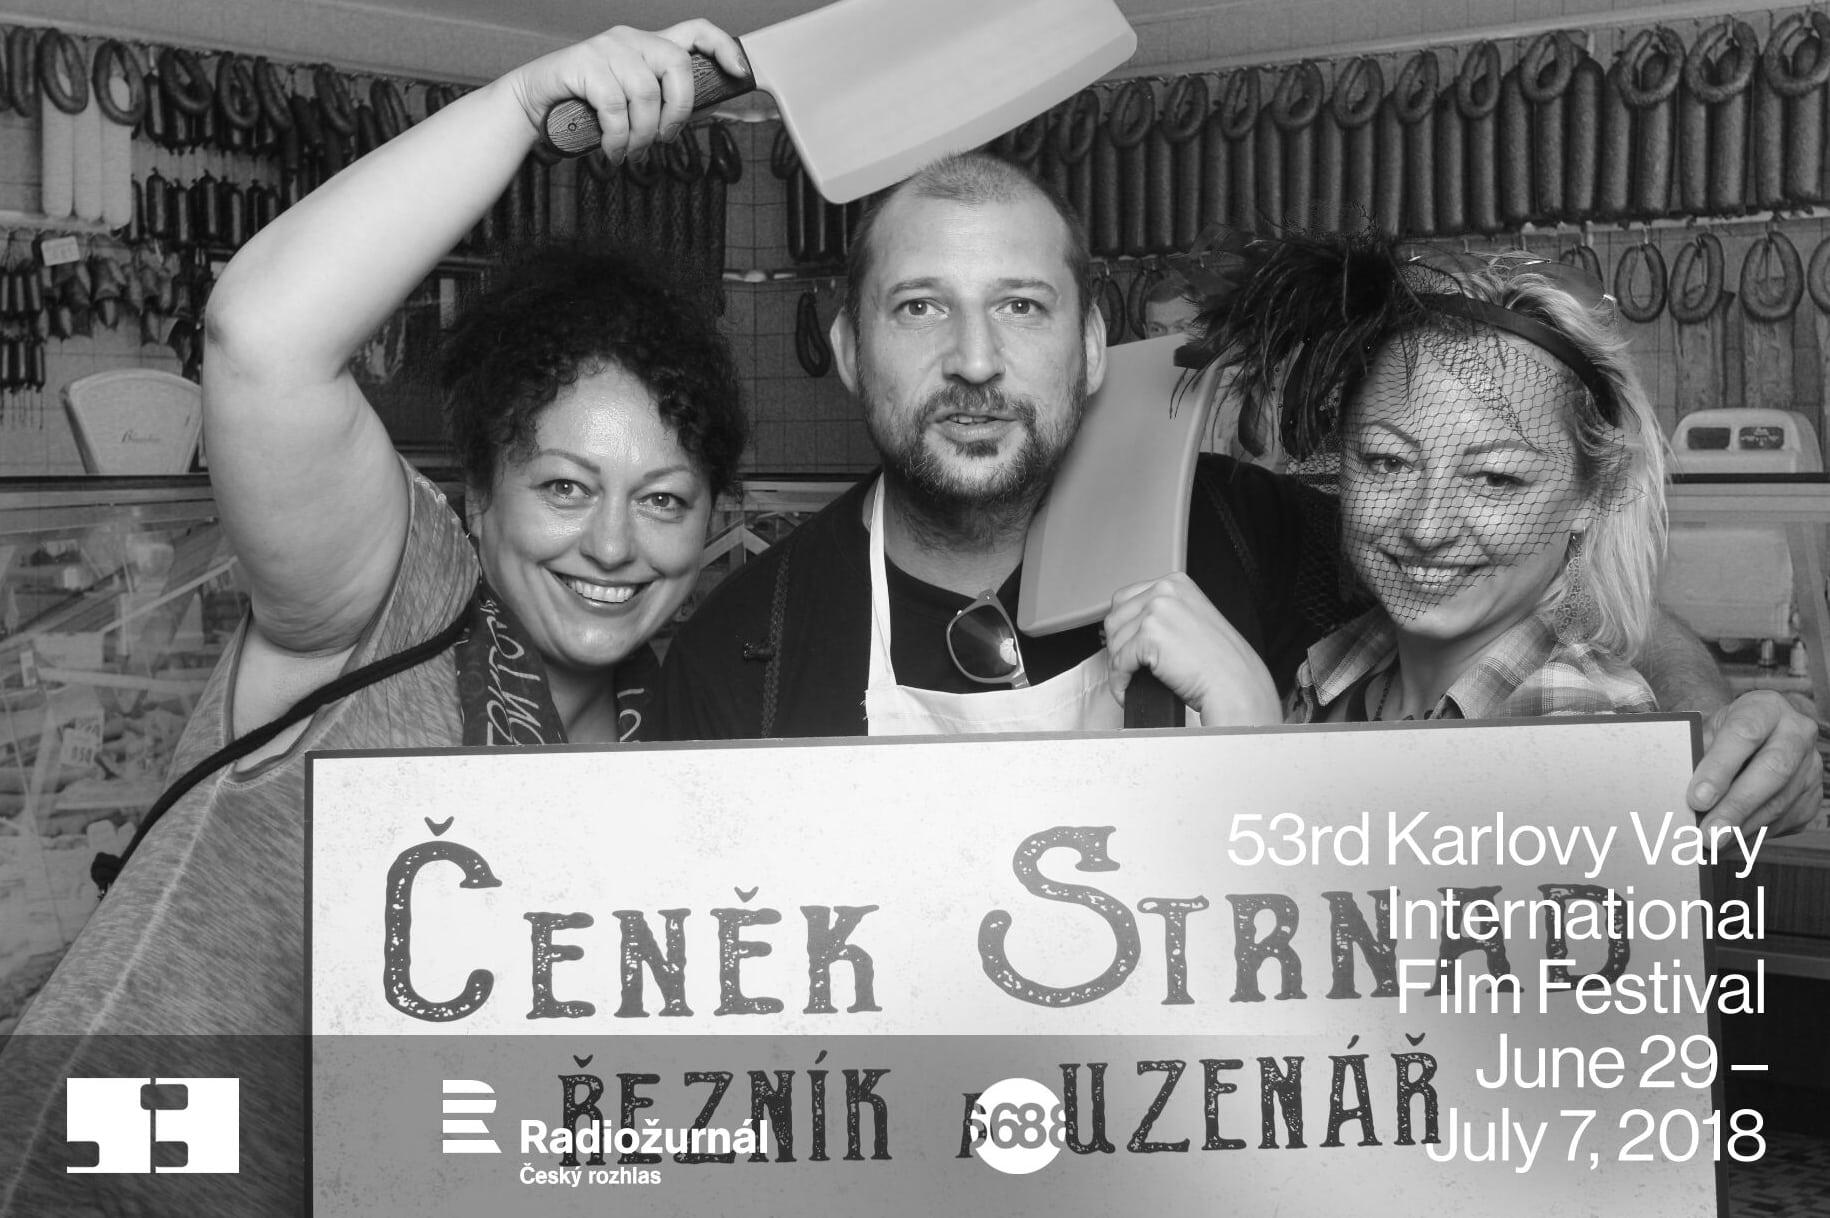 fotokoutek-festival-karlovy-vary-radiozurnal-mff-kv-6-7-2018-461704